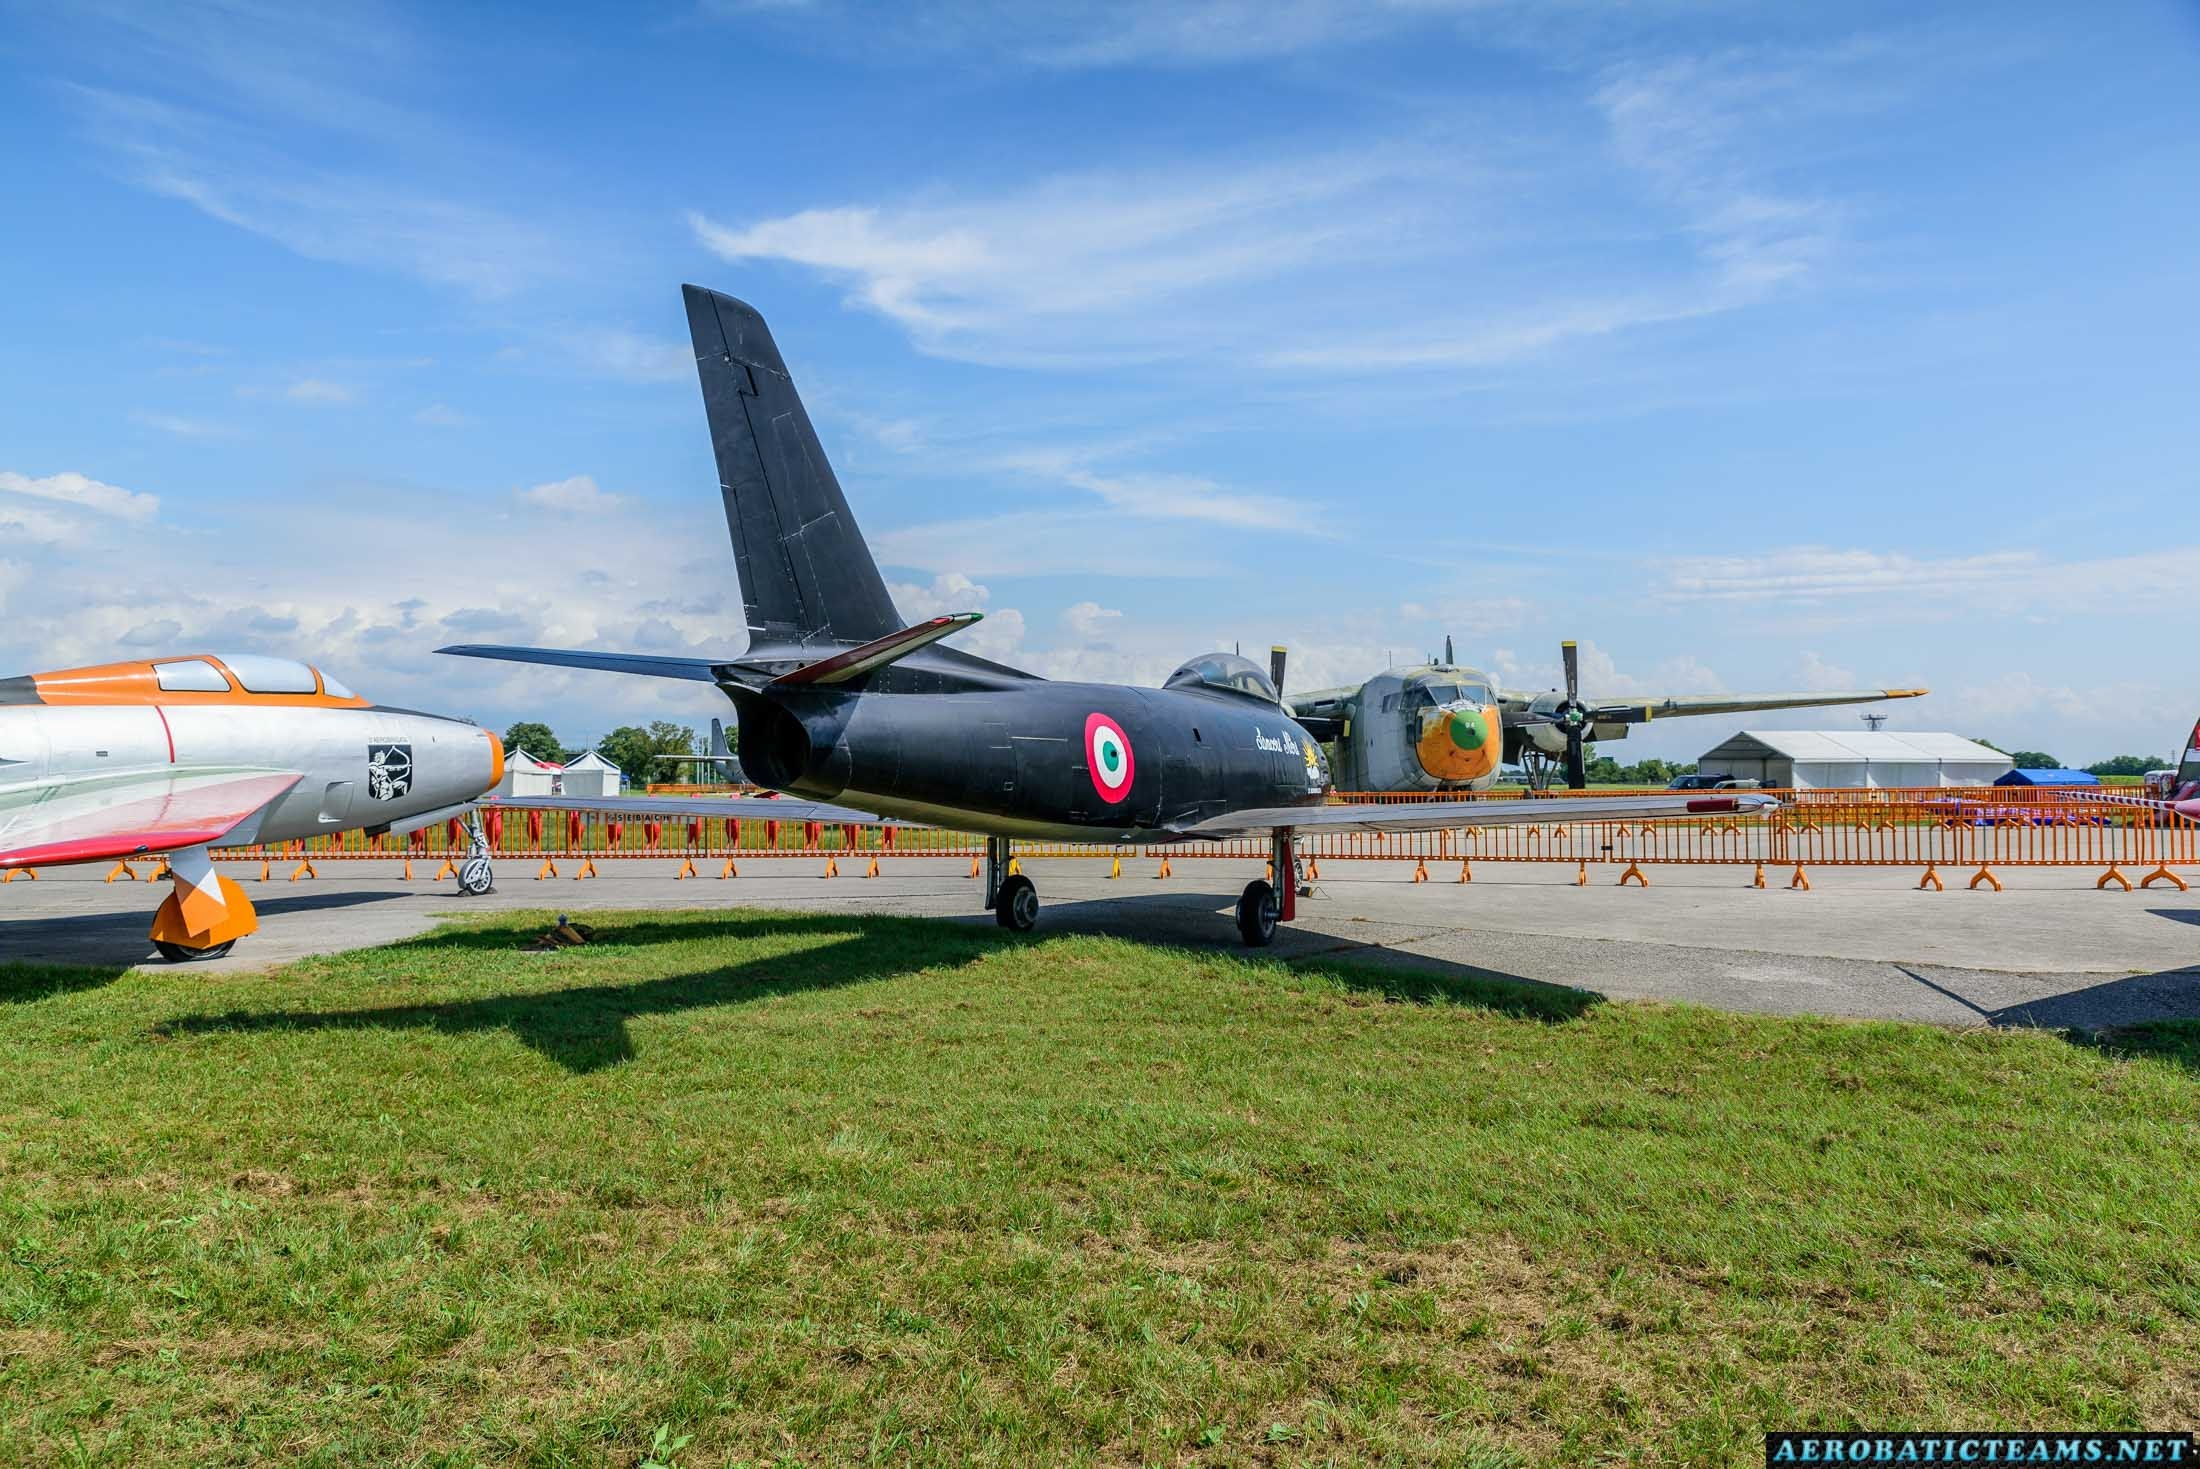 Lanceri Neri Canadair Sabre Mk.4 at Rivolto Air Base